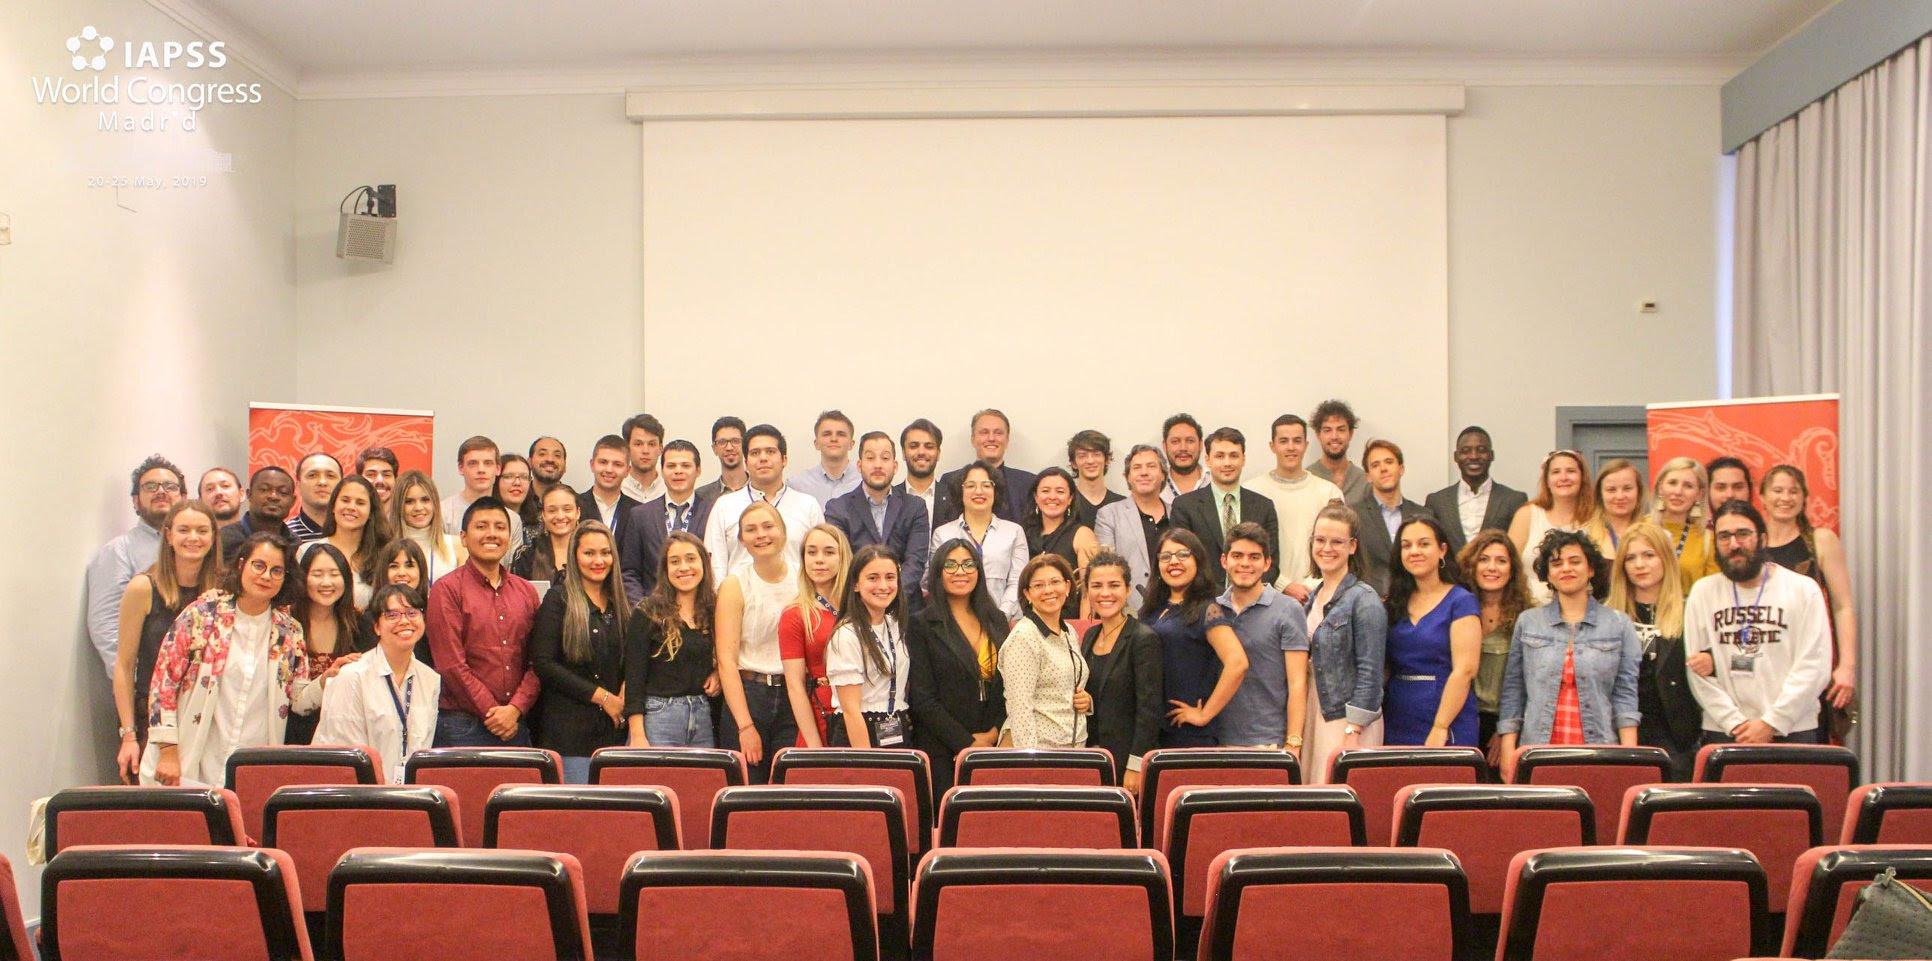 International Association of Political Science Students (IAPSS), with our students Dániel Cséfalvay and Matej Bílik.